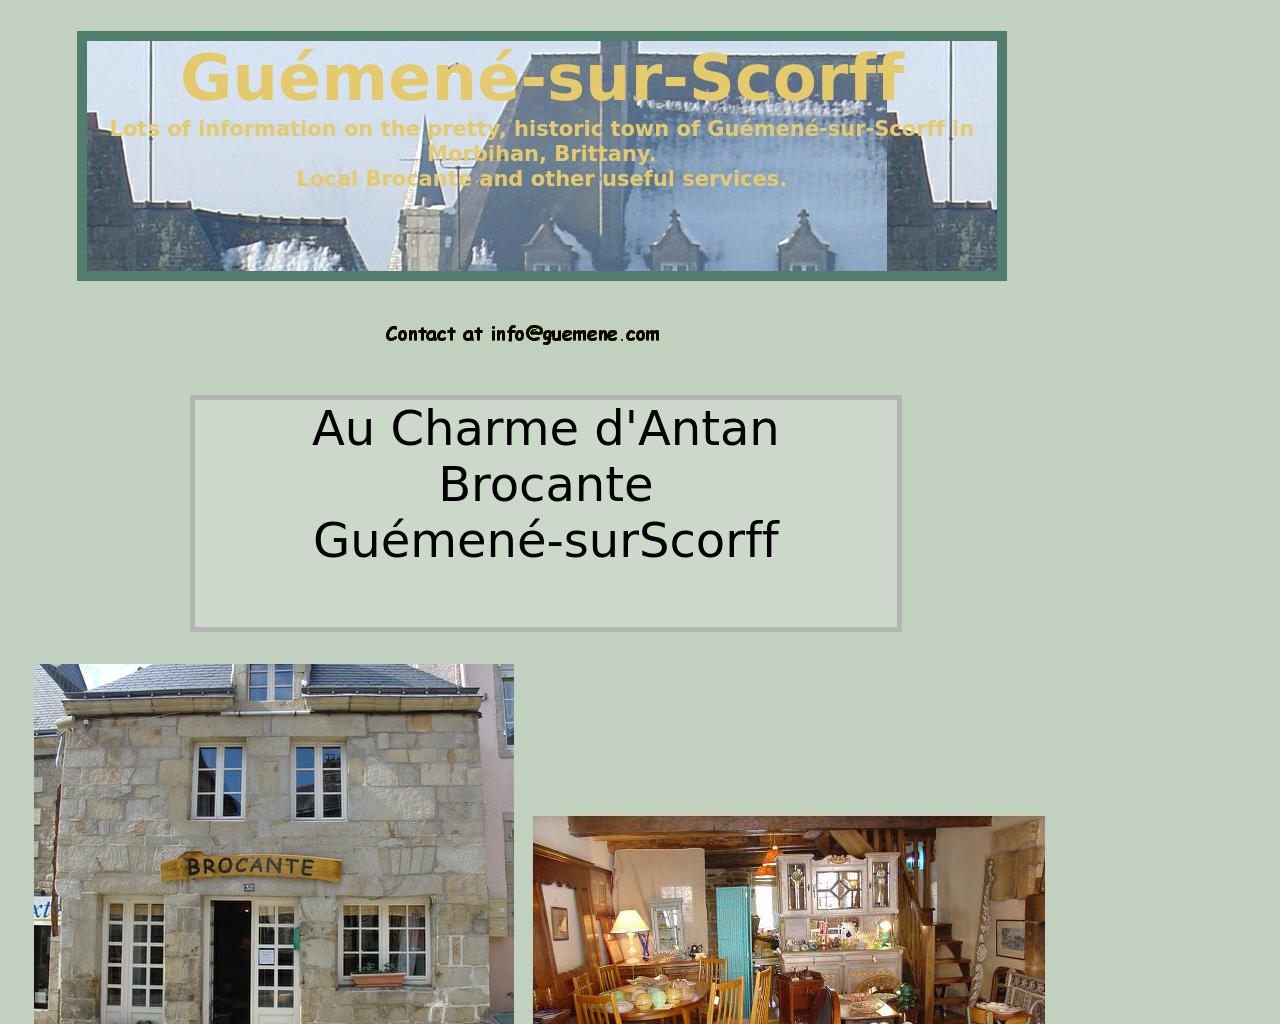 Guemene-Sur-Scorff-Advertising-Reviews-Pricing